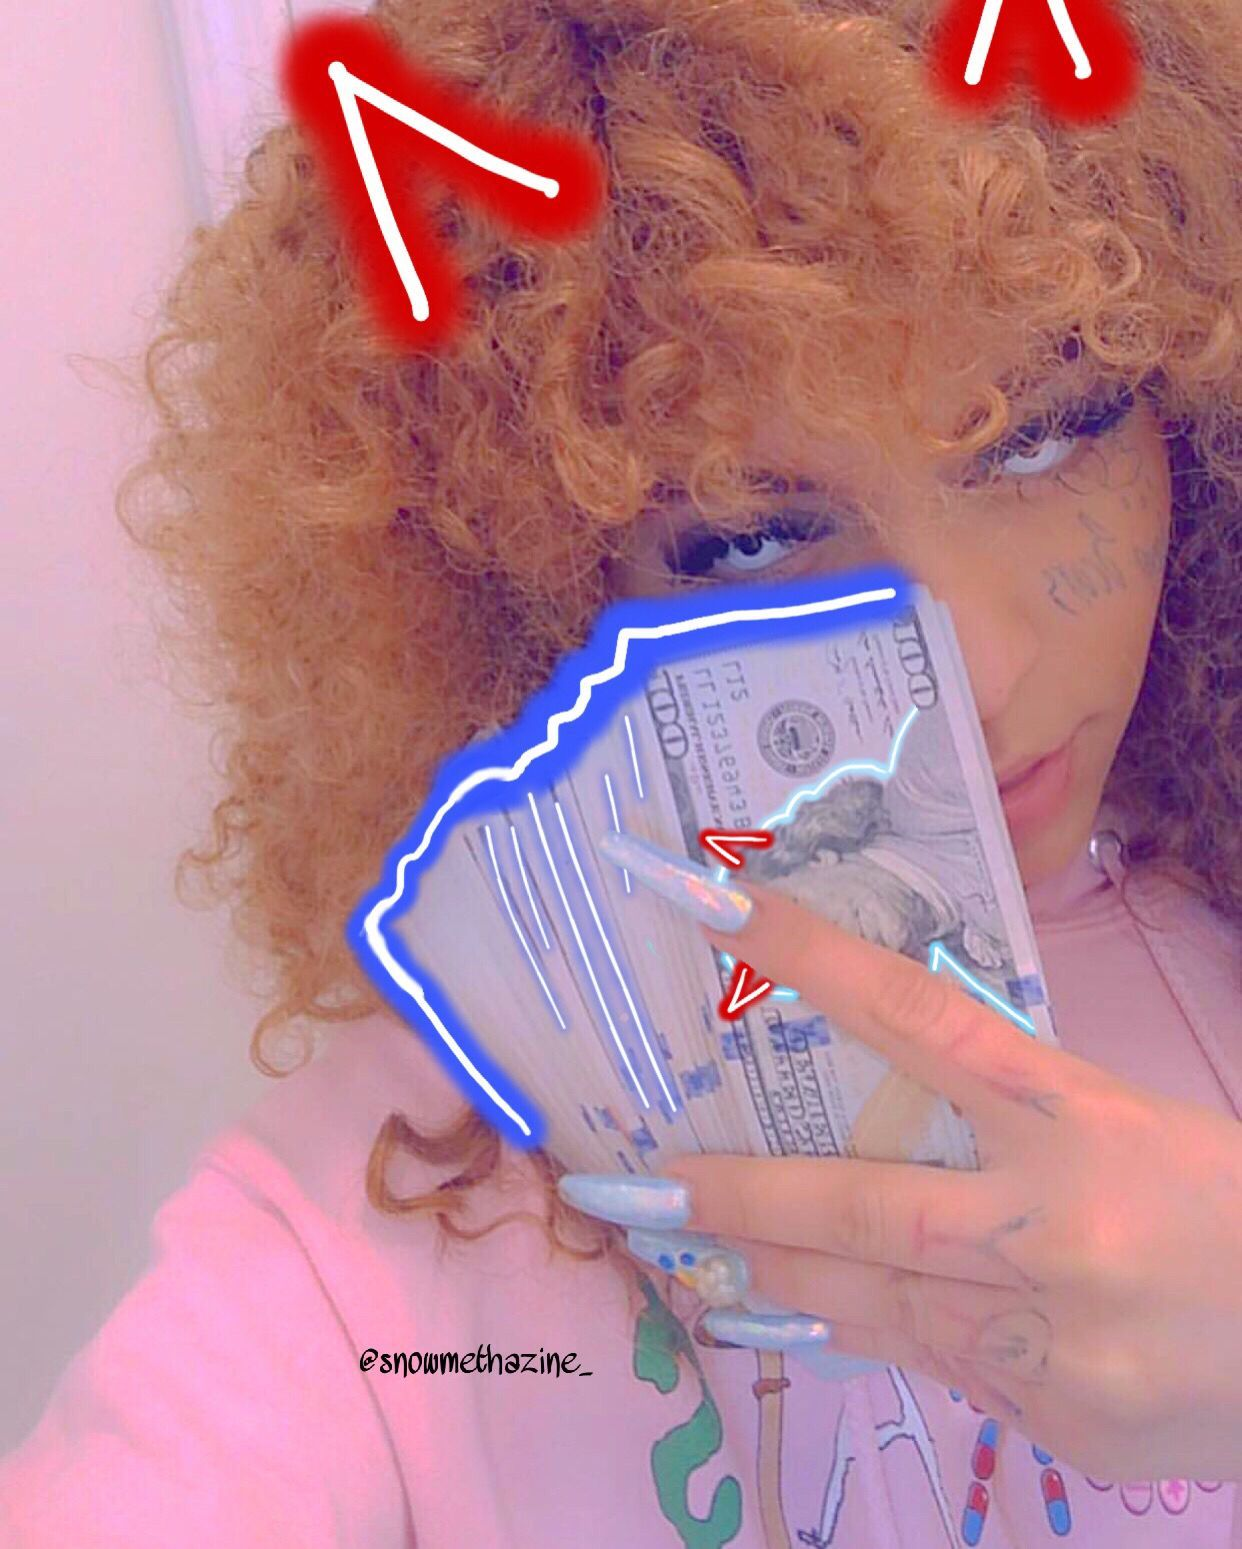 Gangster Girl Bad Girl Aesthetic Rapper Wallpaper Gangsta Pink Ski Mask Aesthetic 3027297 Hd Wallpaper Backgrounds Download